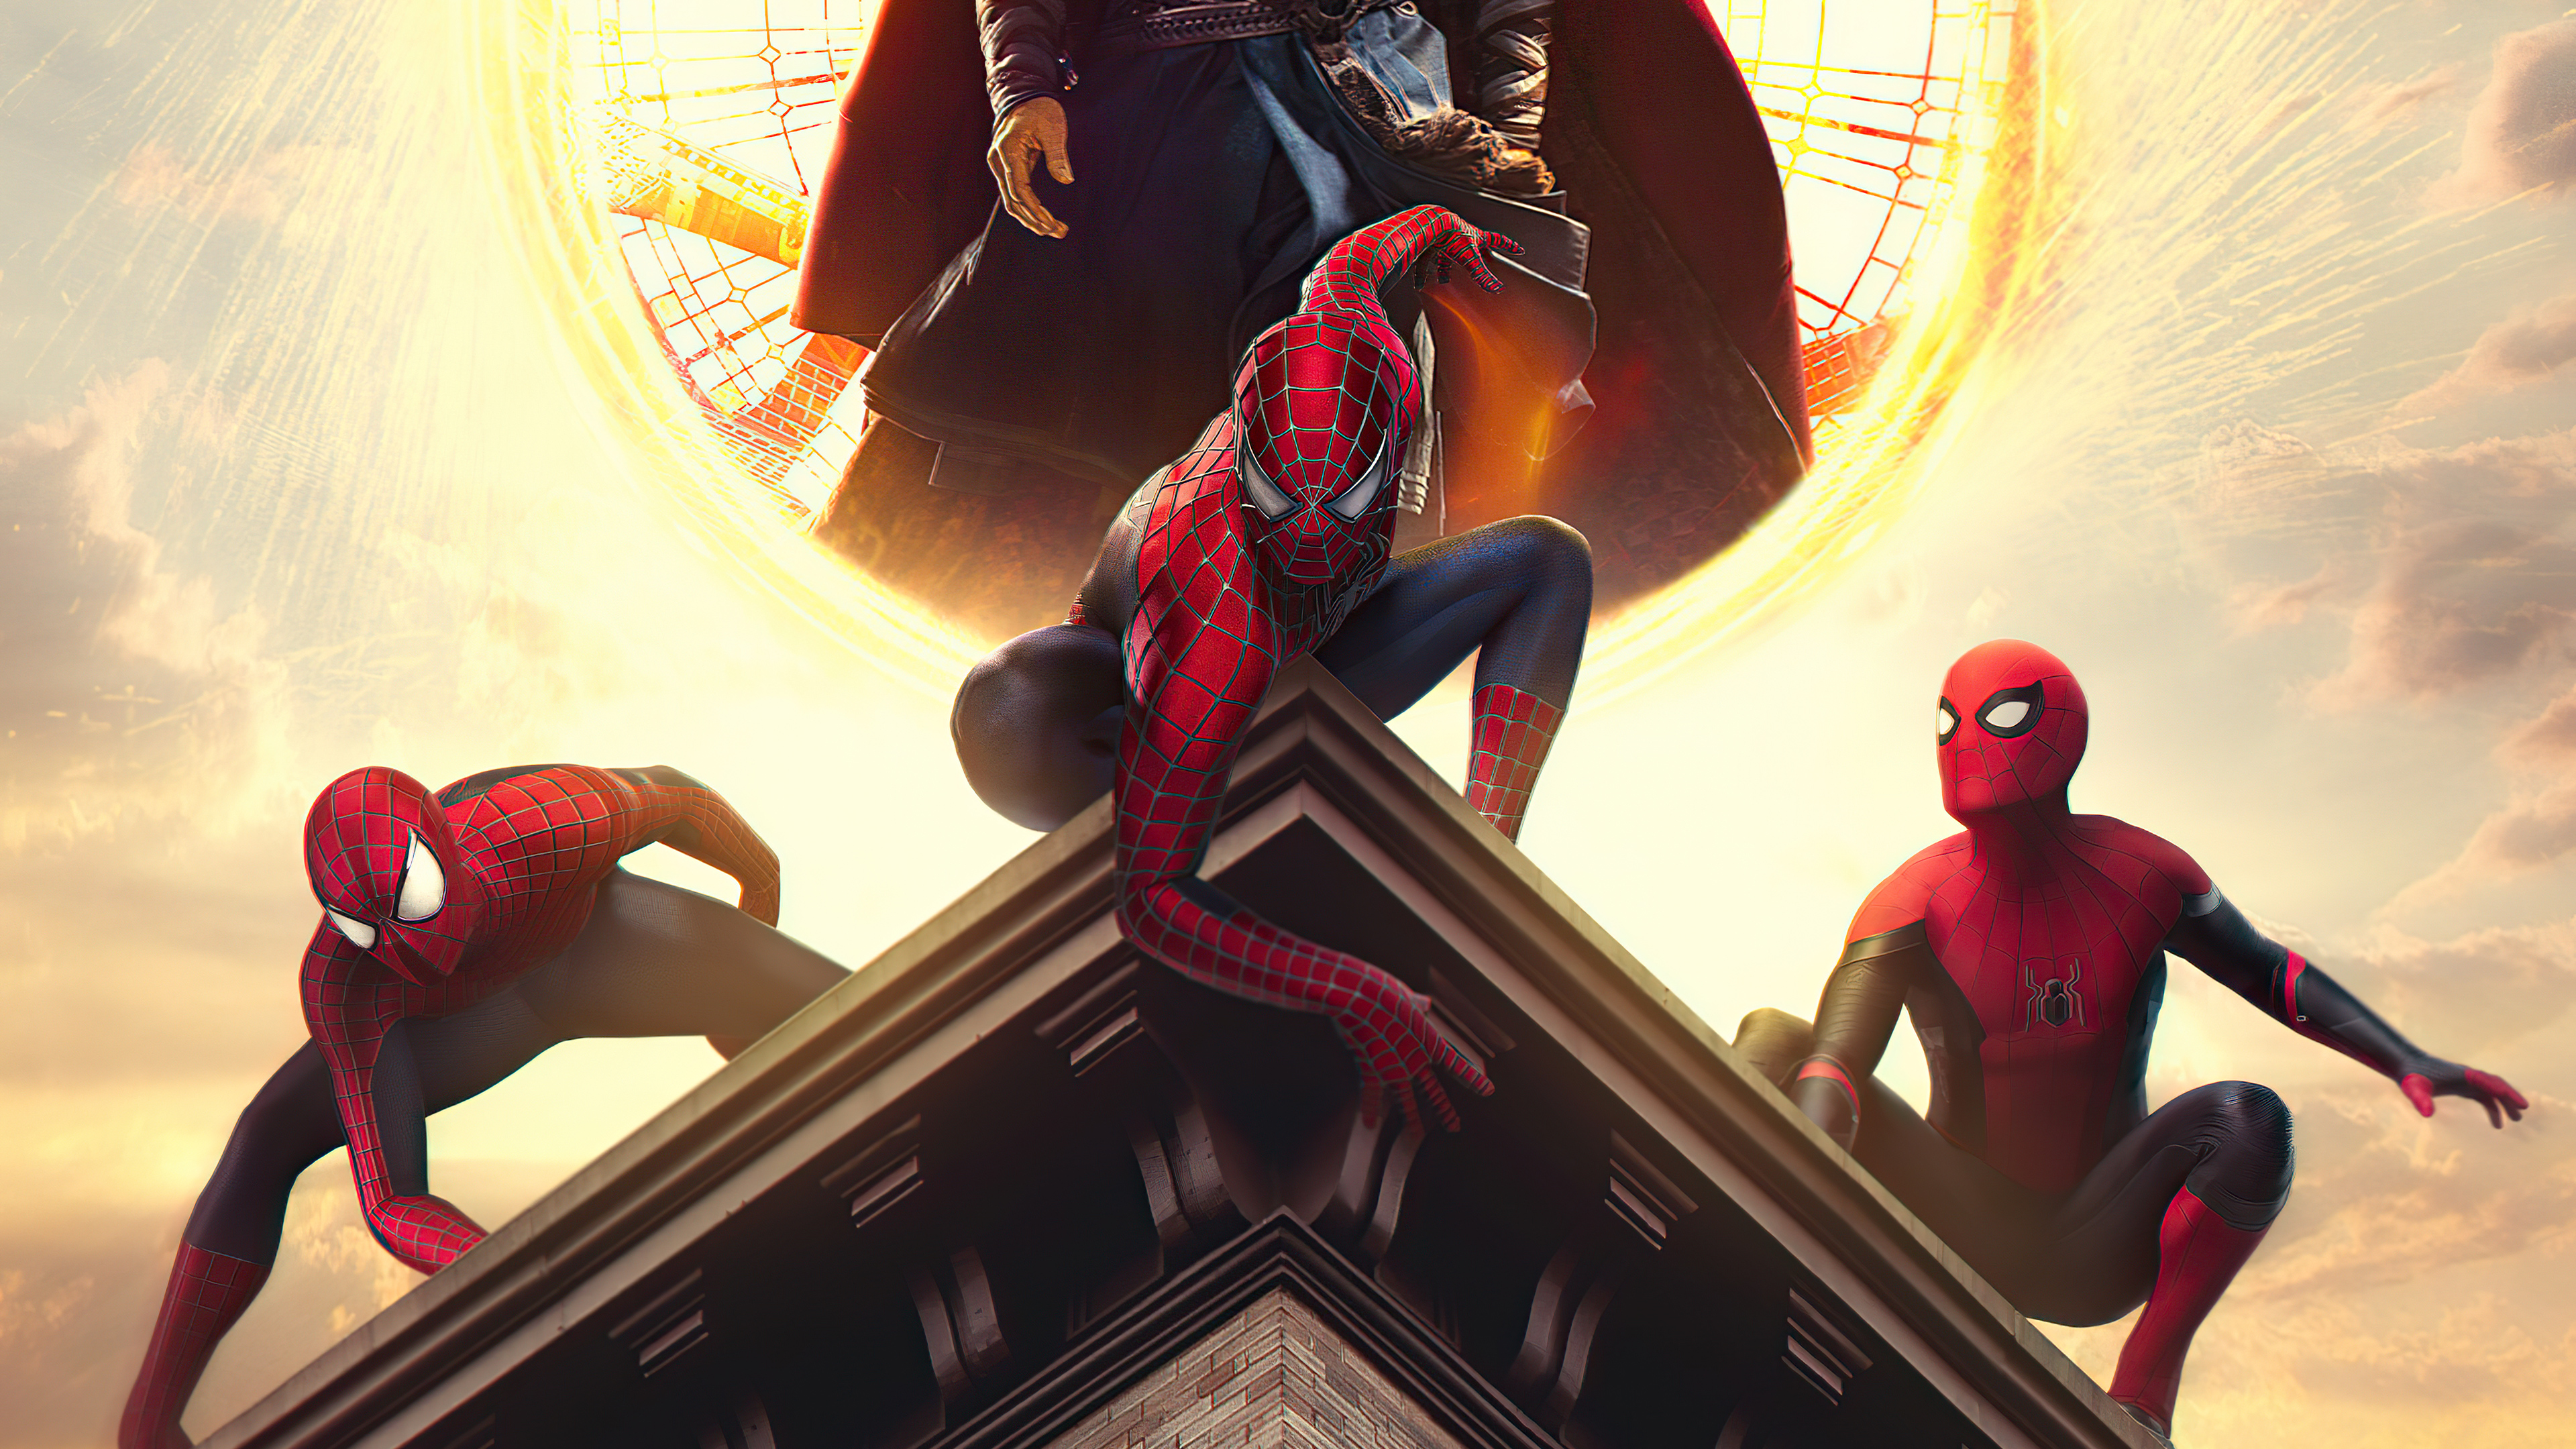 Wallpaper Spiderman 3